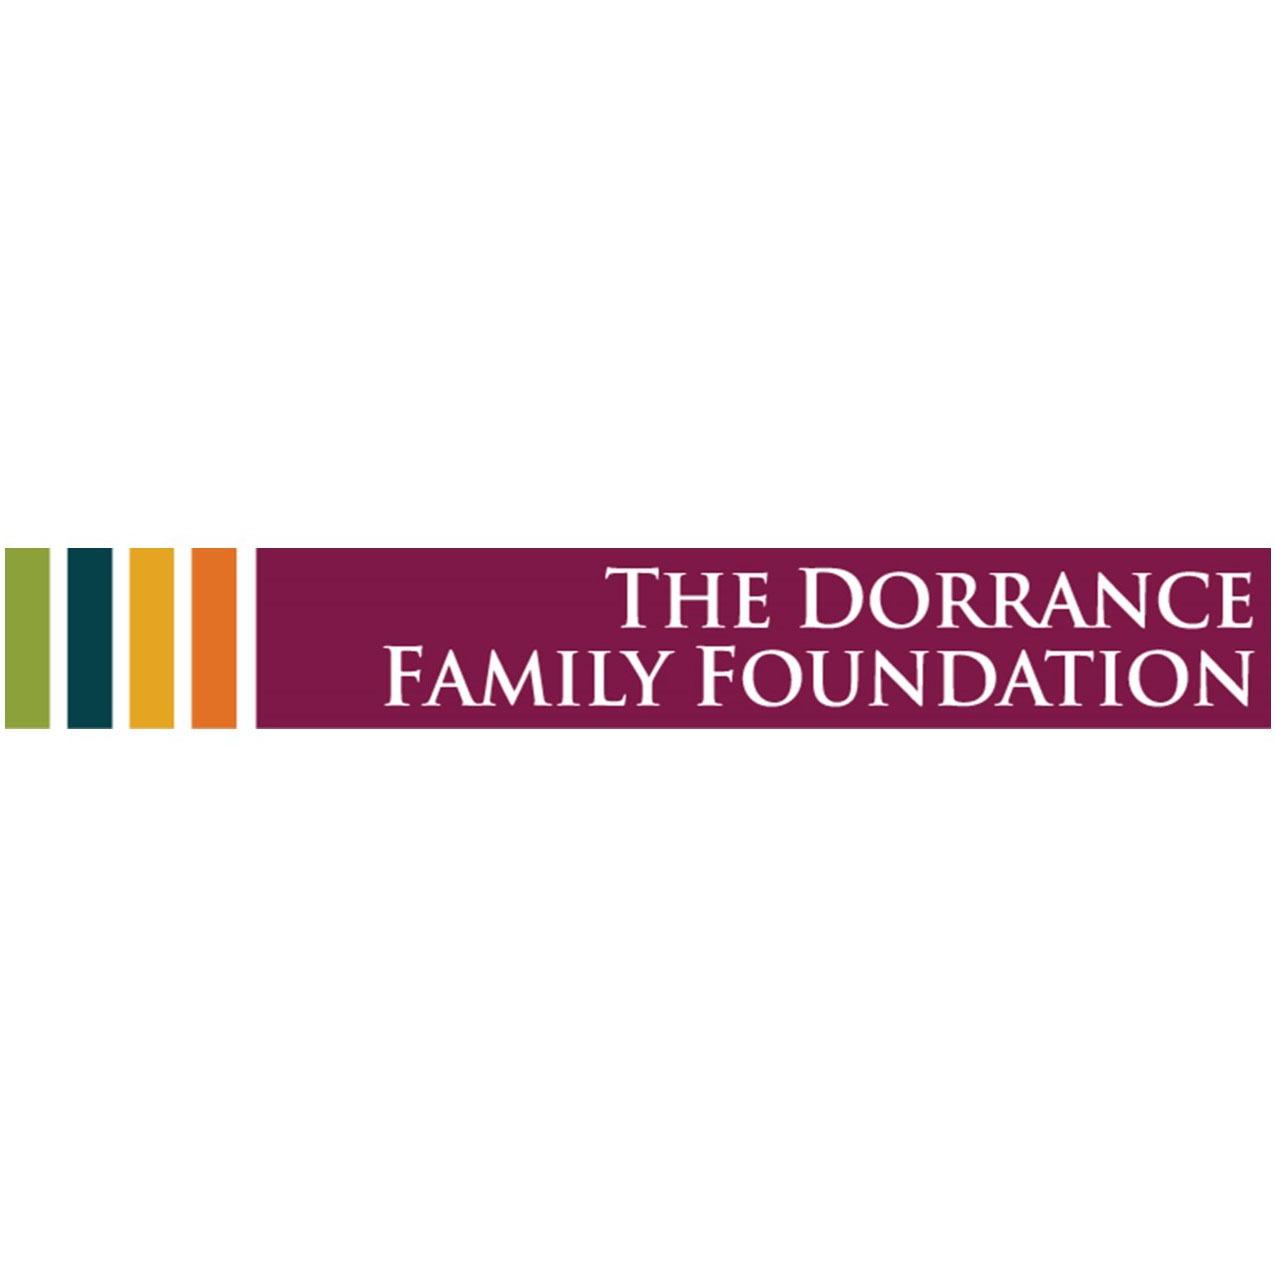 The Dorrance Family Foundation